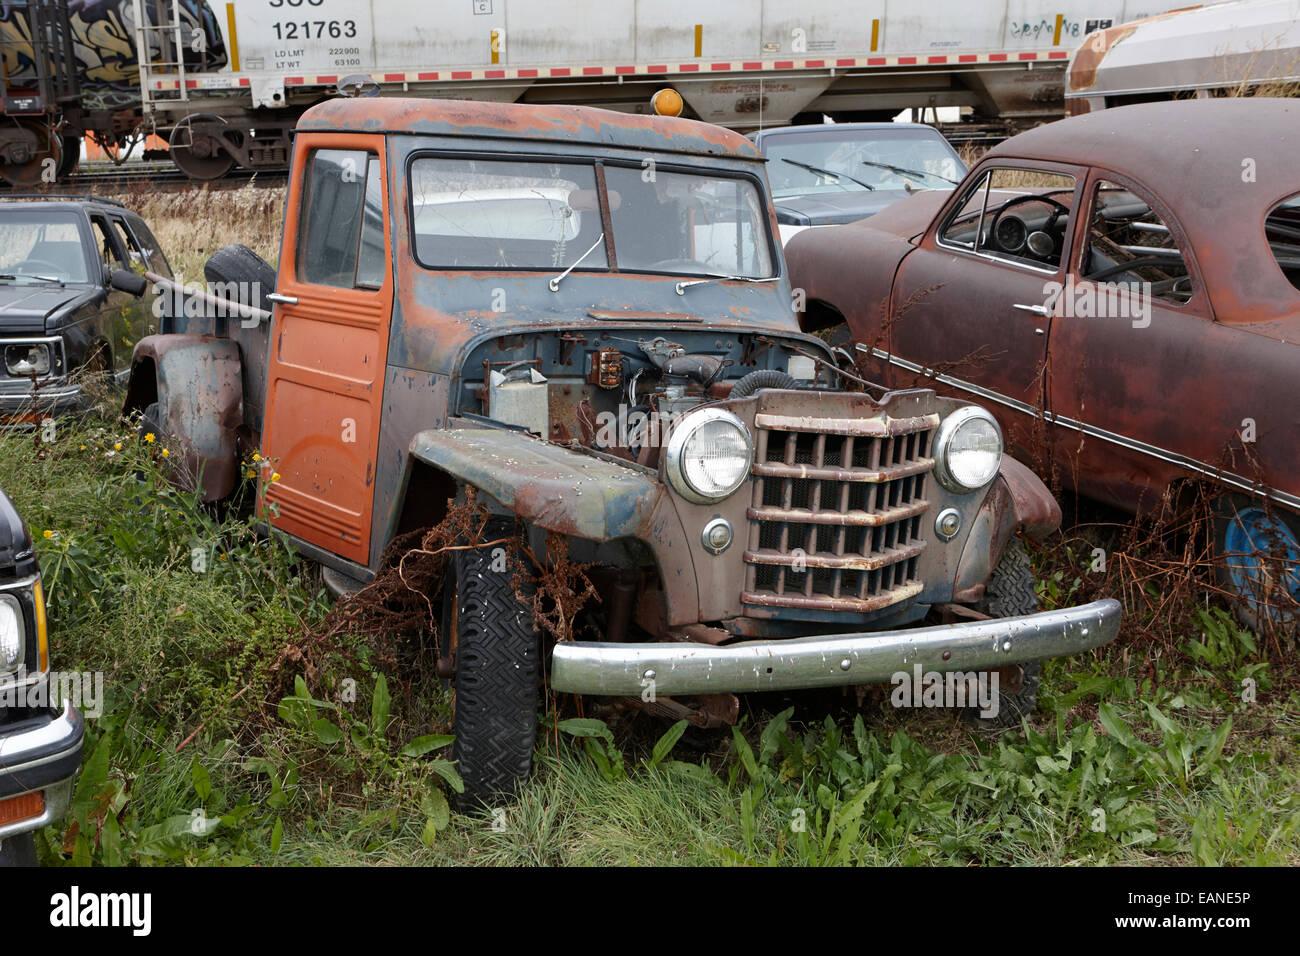 vintage historic jeep one ton pickup vehicles in junkyard Saskatchewan Canada - Stock Image